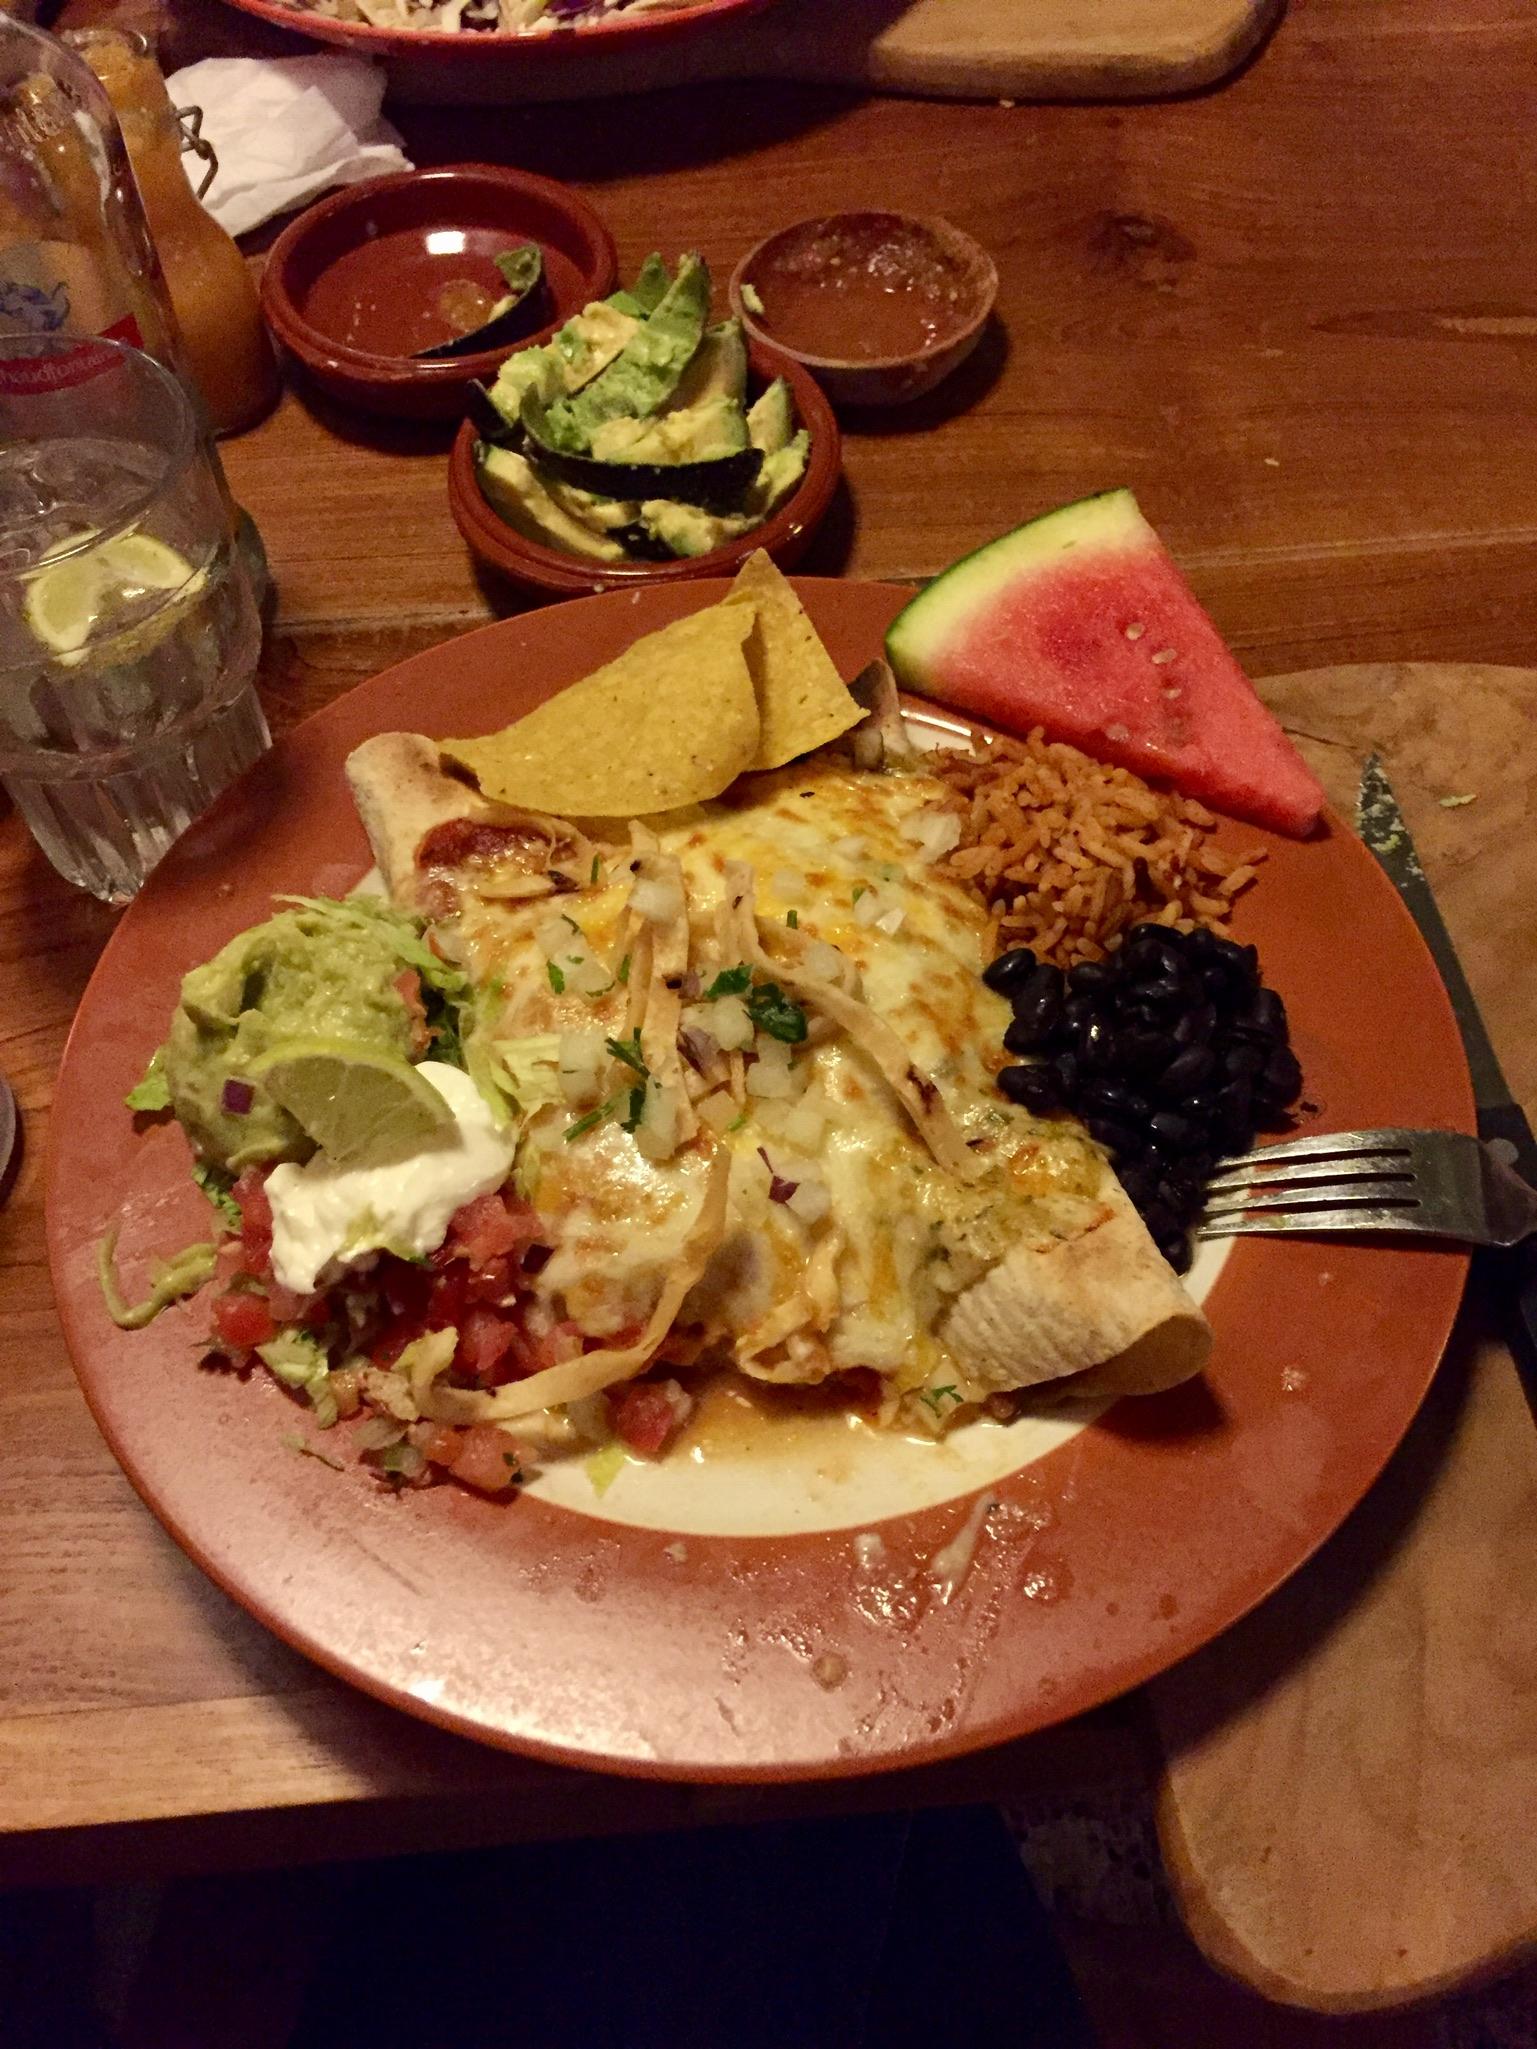 Enchiladas at Cantina 023 in Haarlem.